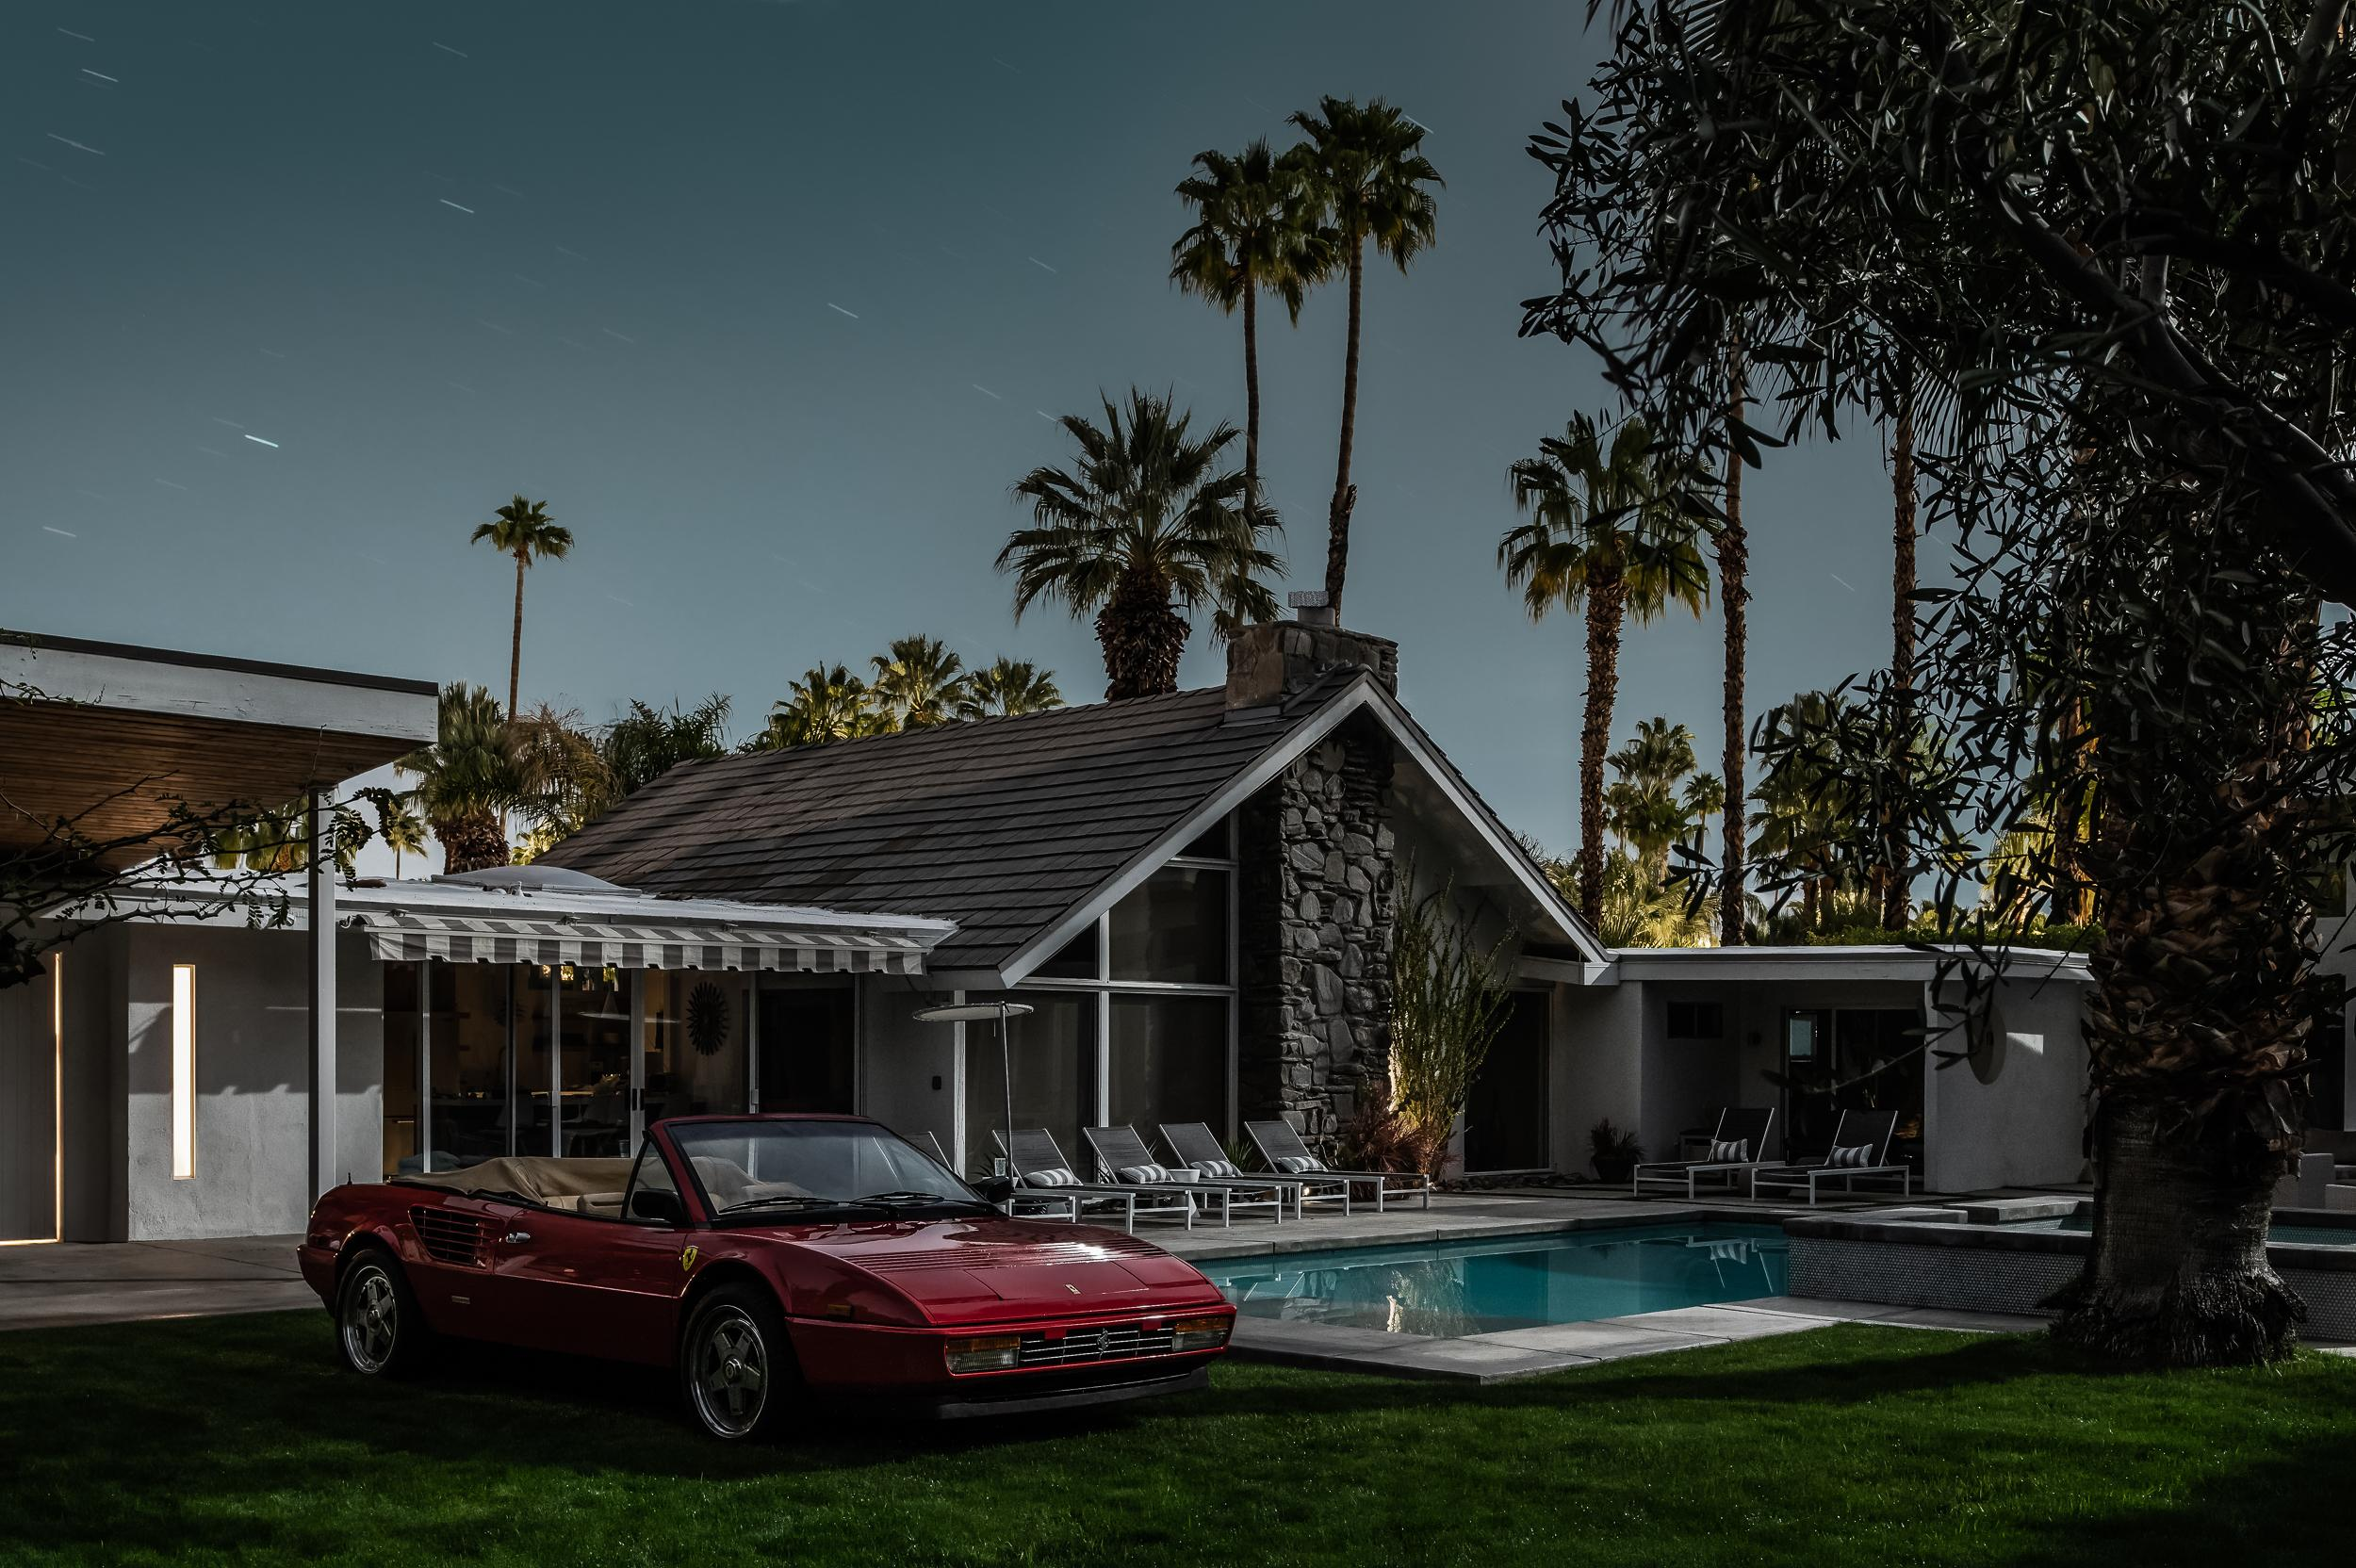 Tom Blachford Mid Century Modern Architecture Classic Ferrari